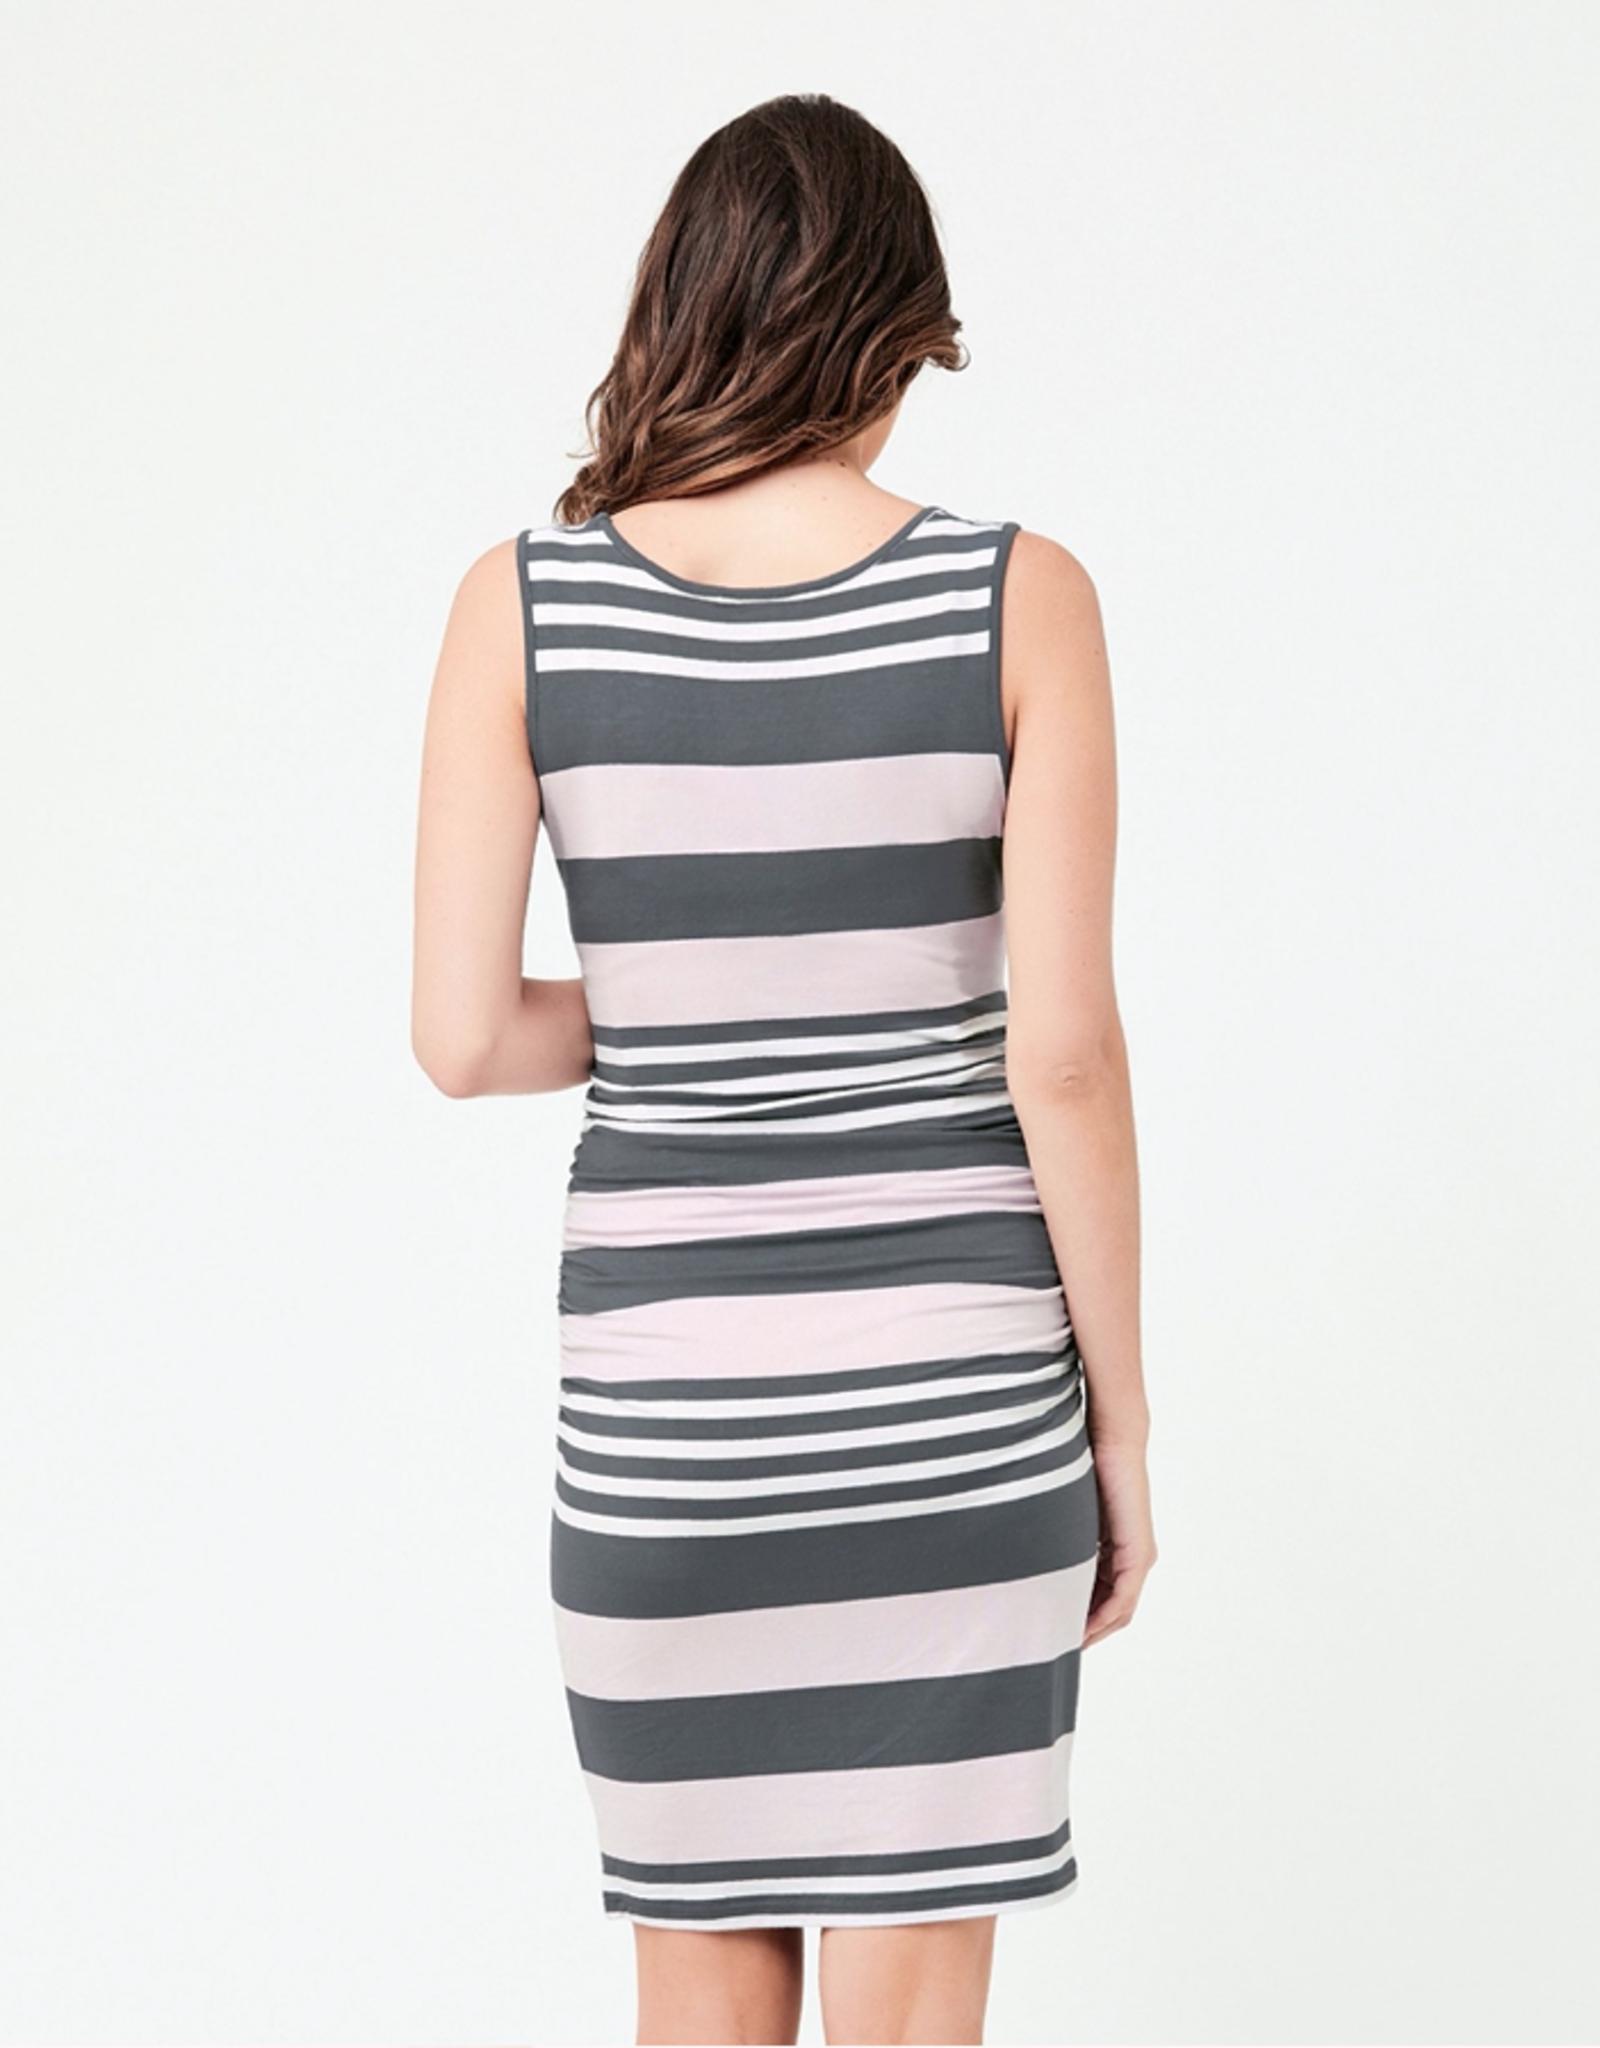 Ripe Maternity Stripe Nursing Dress Lilac / Steel / White